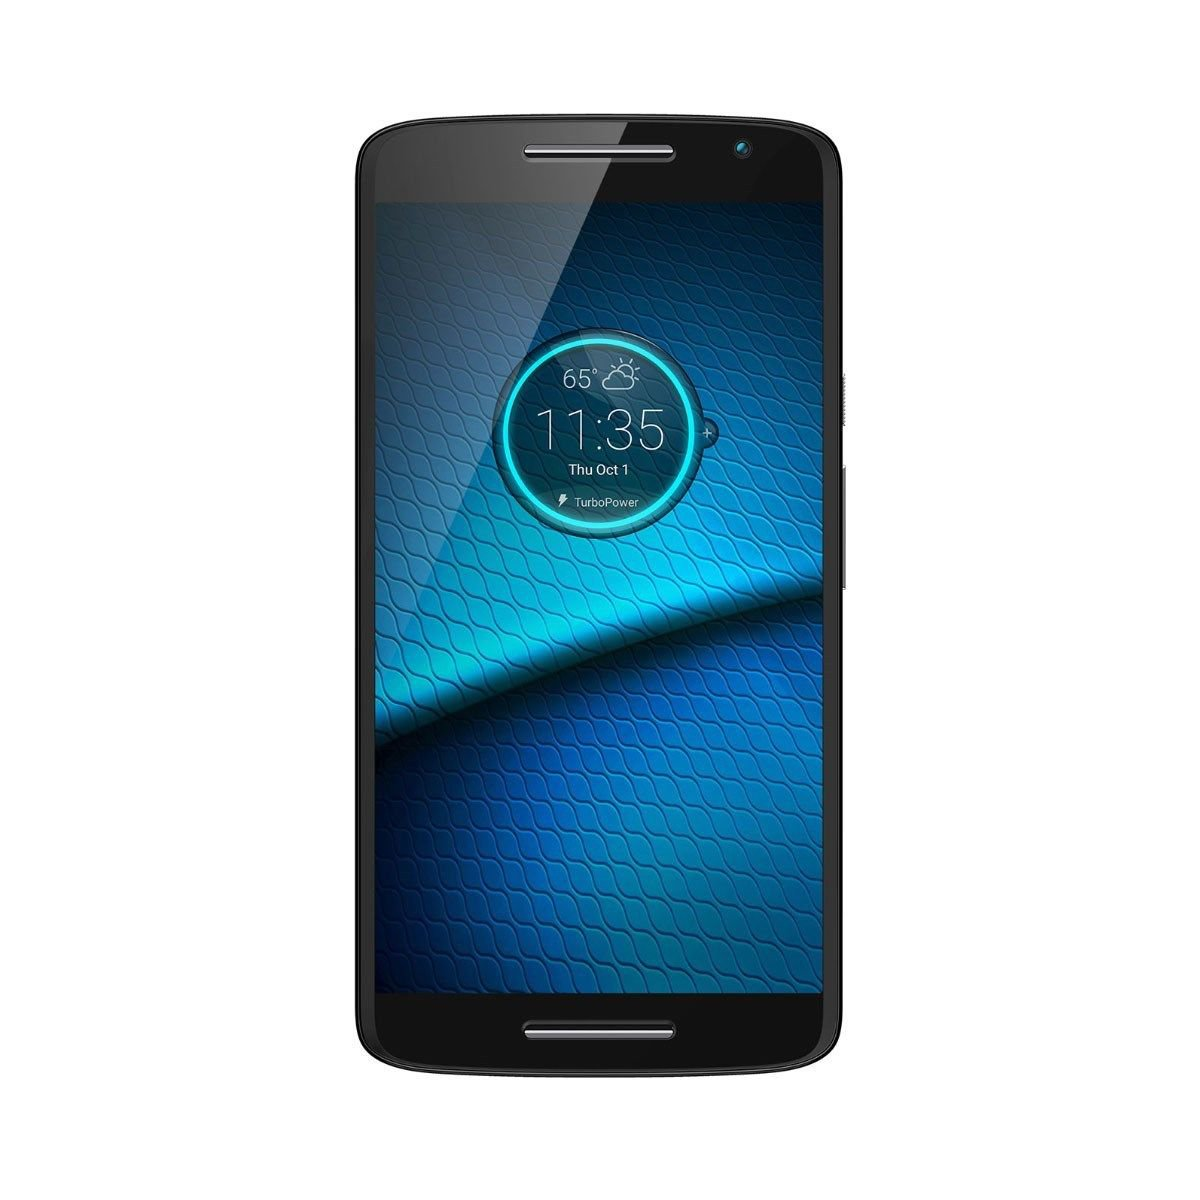 Motorola Xt1565 Droid Maxx 2 16gb Verizon Wireless Android